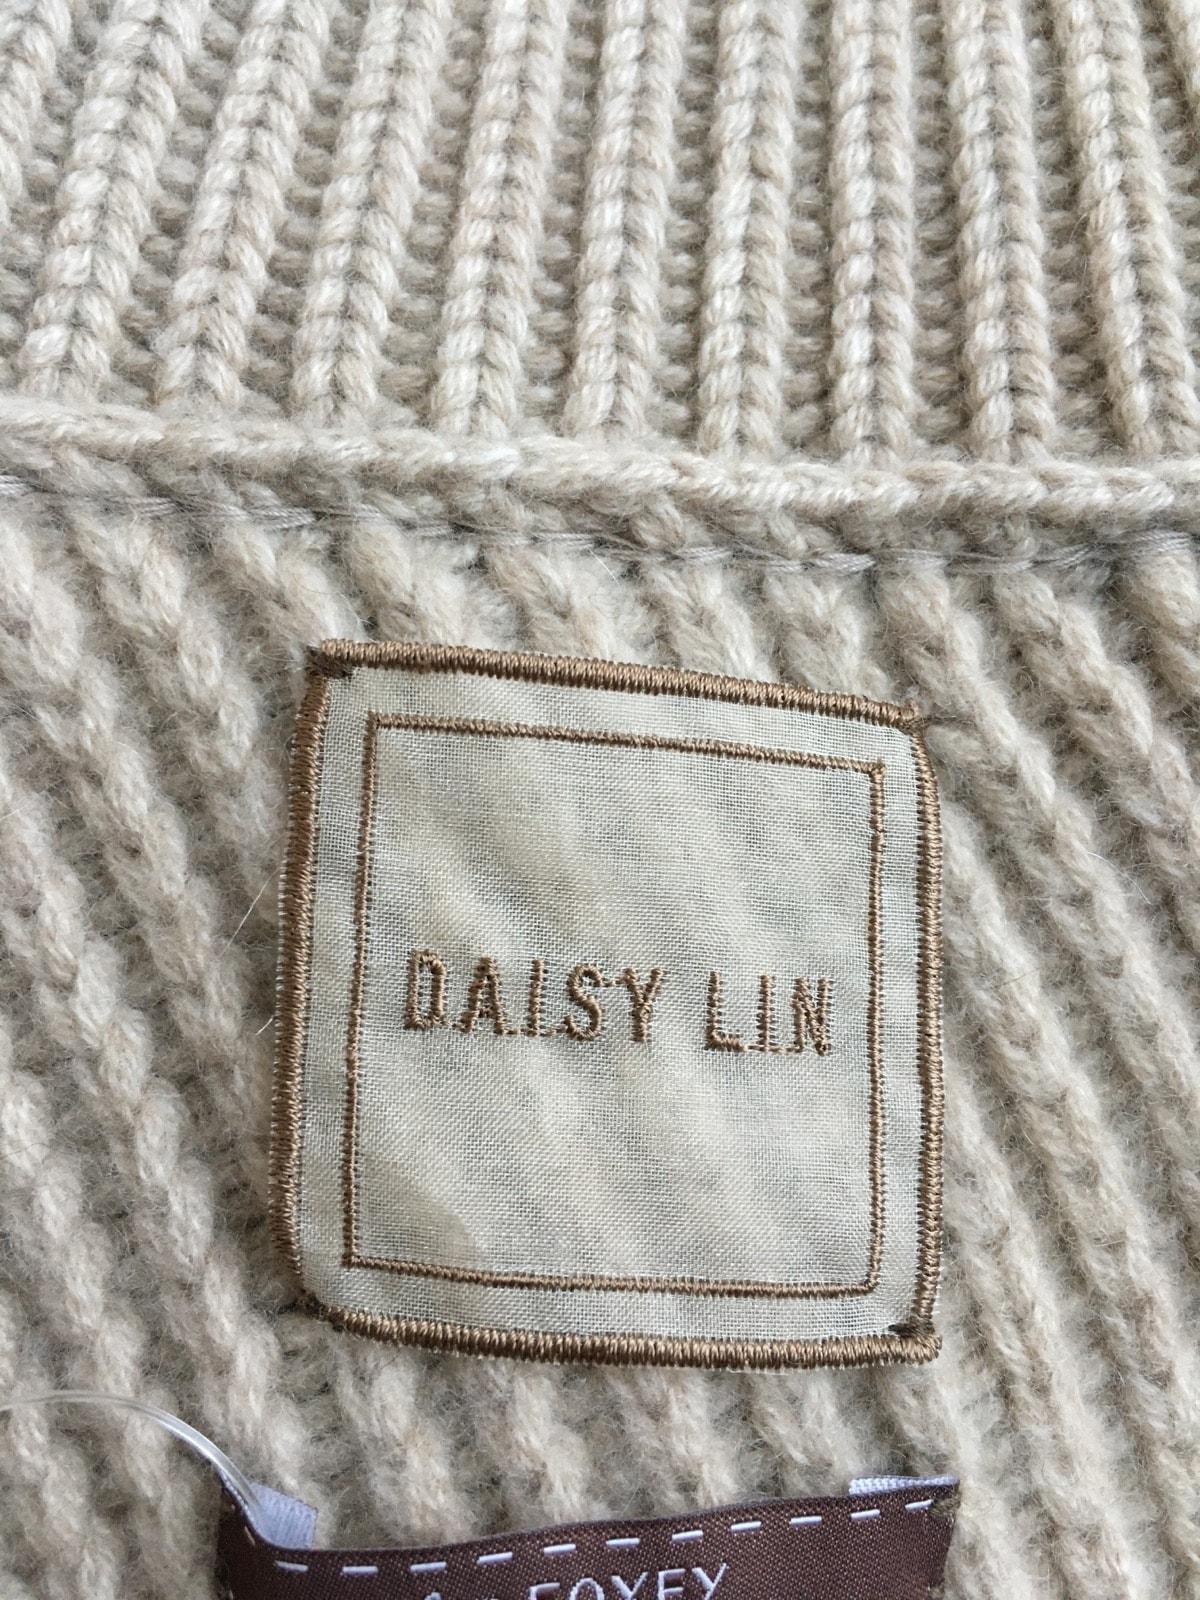 DAISY LIN(デイジーリン)のワンピース